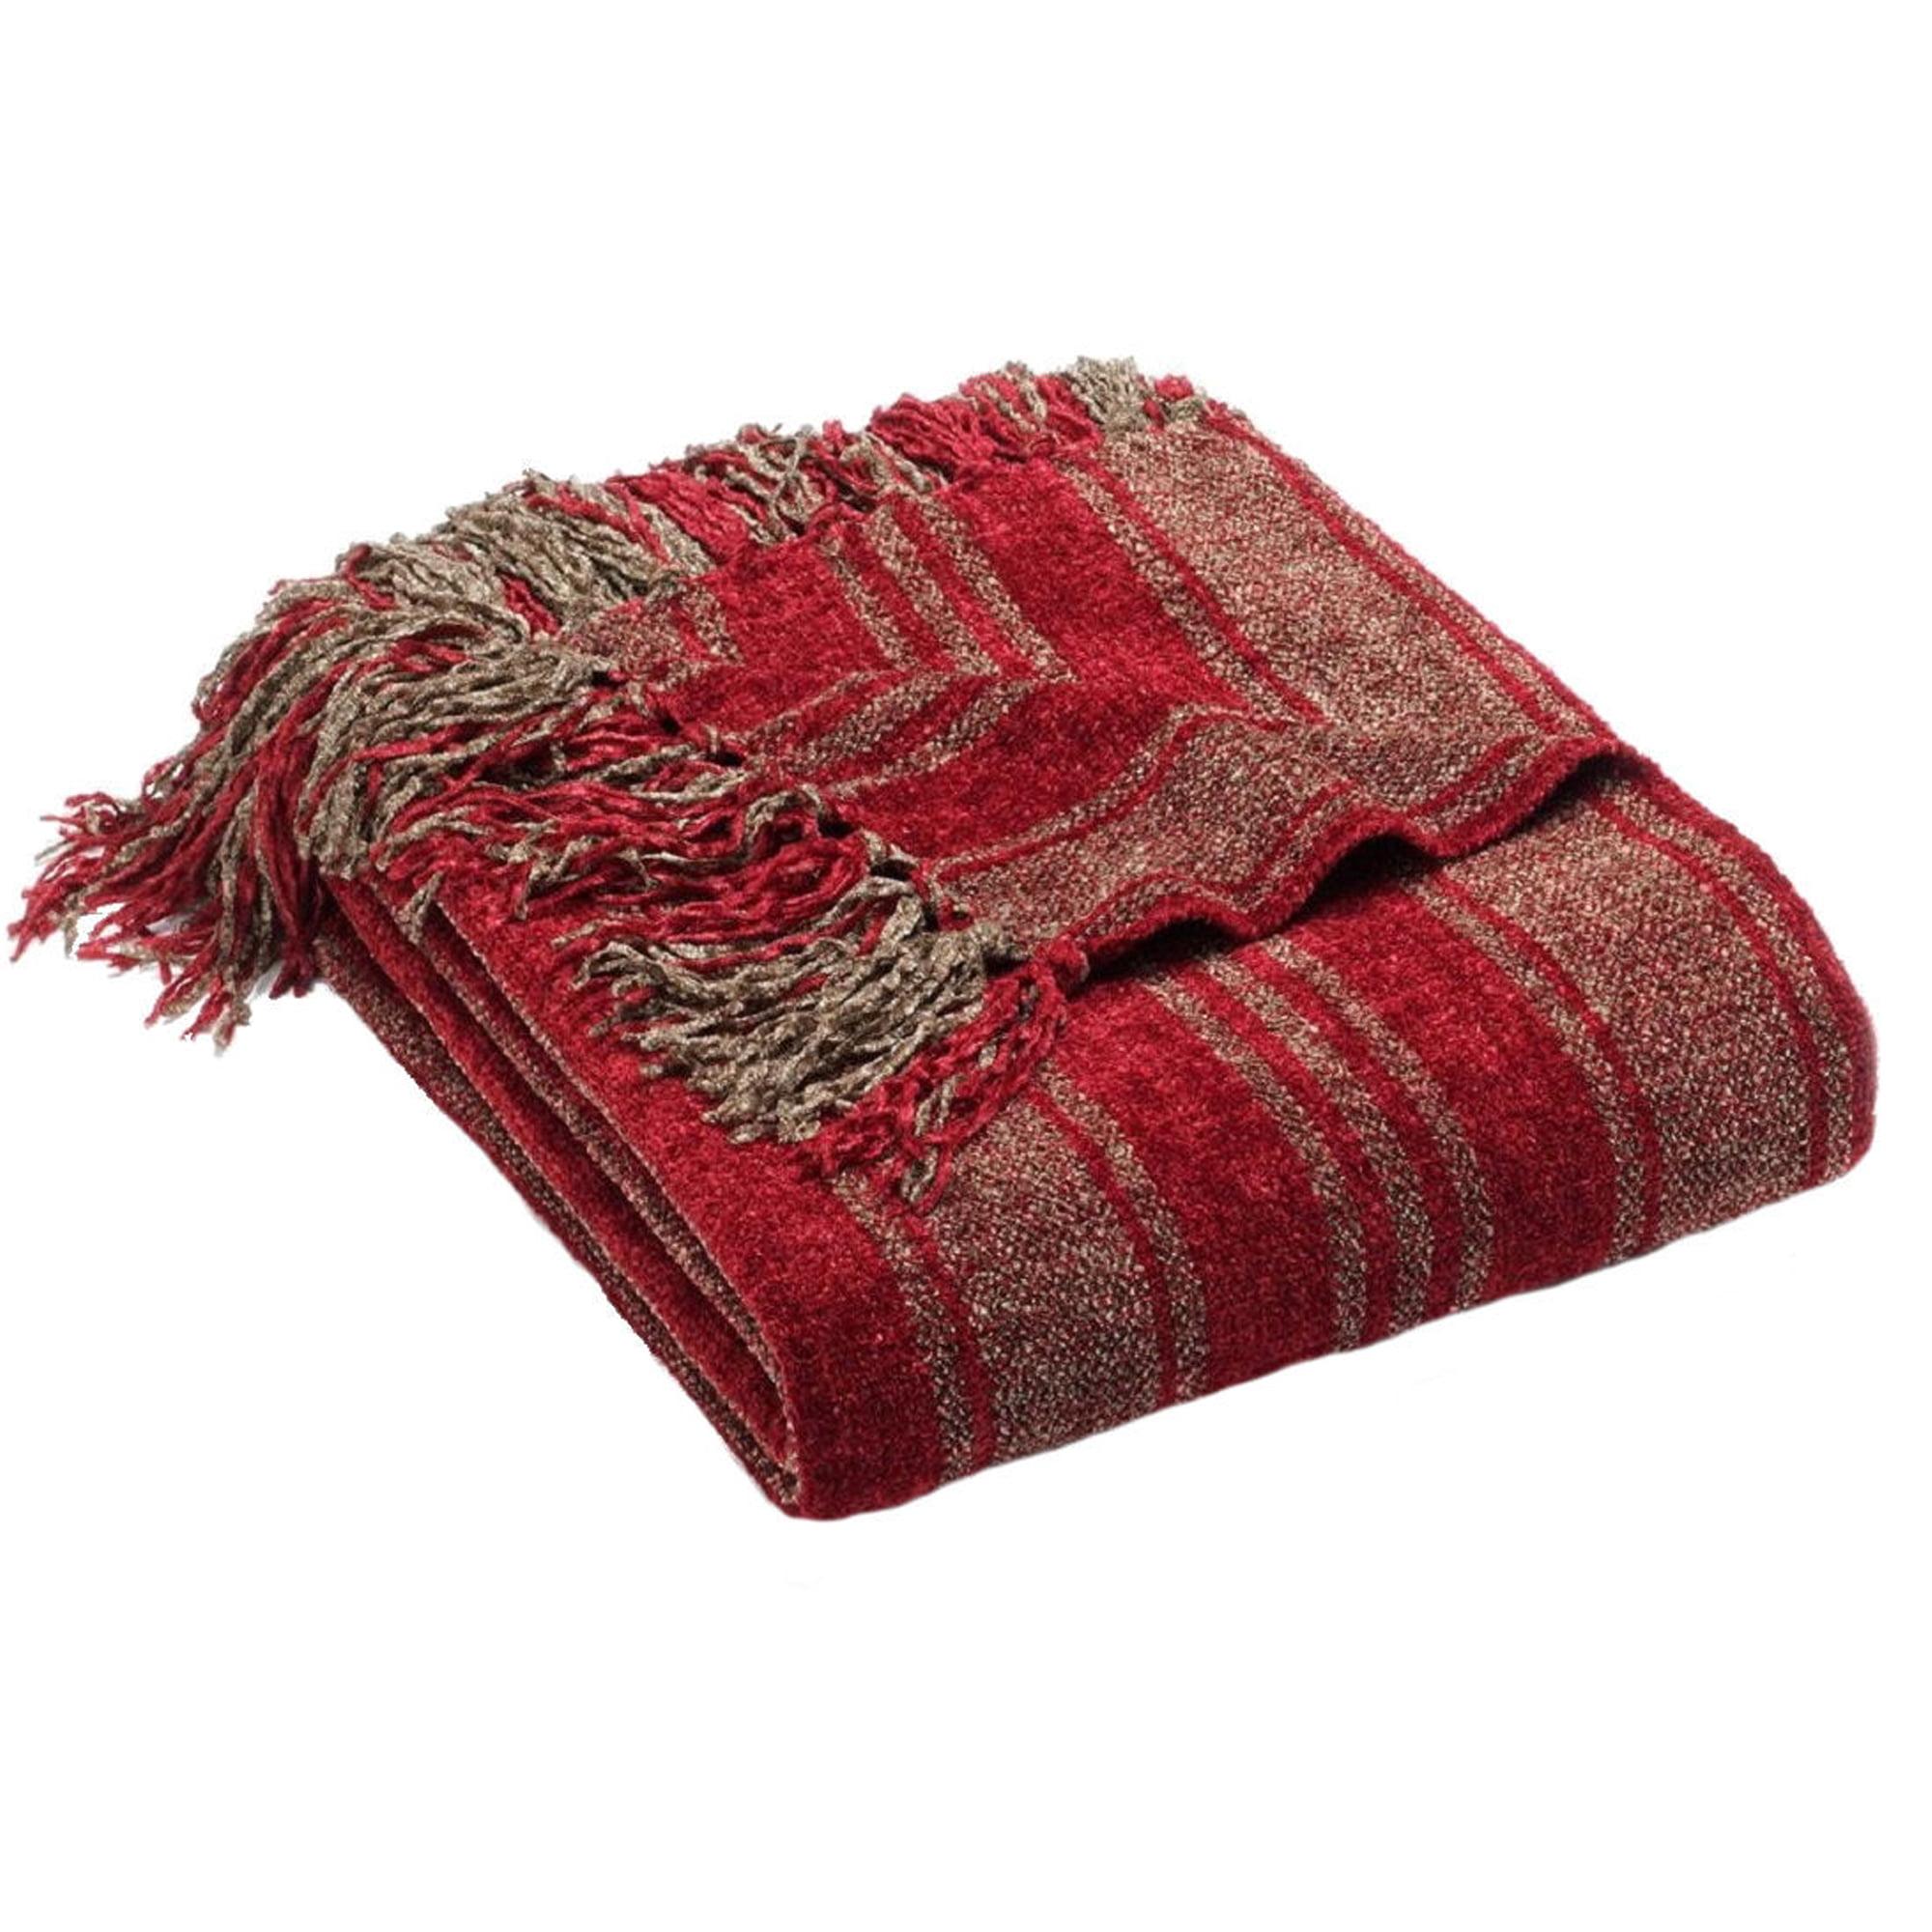 Luxury Striped Chenille Throw Blanket